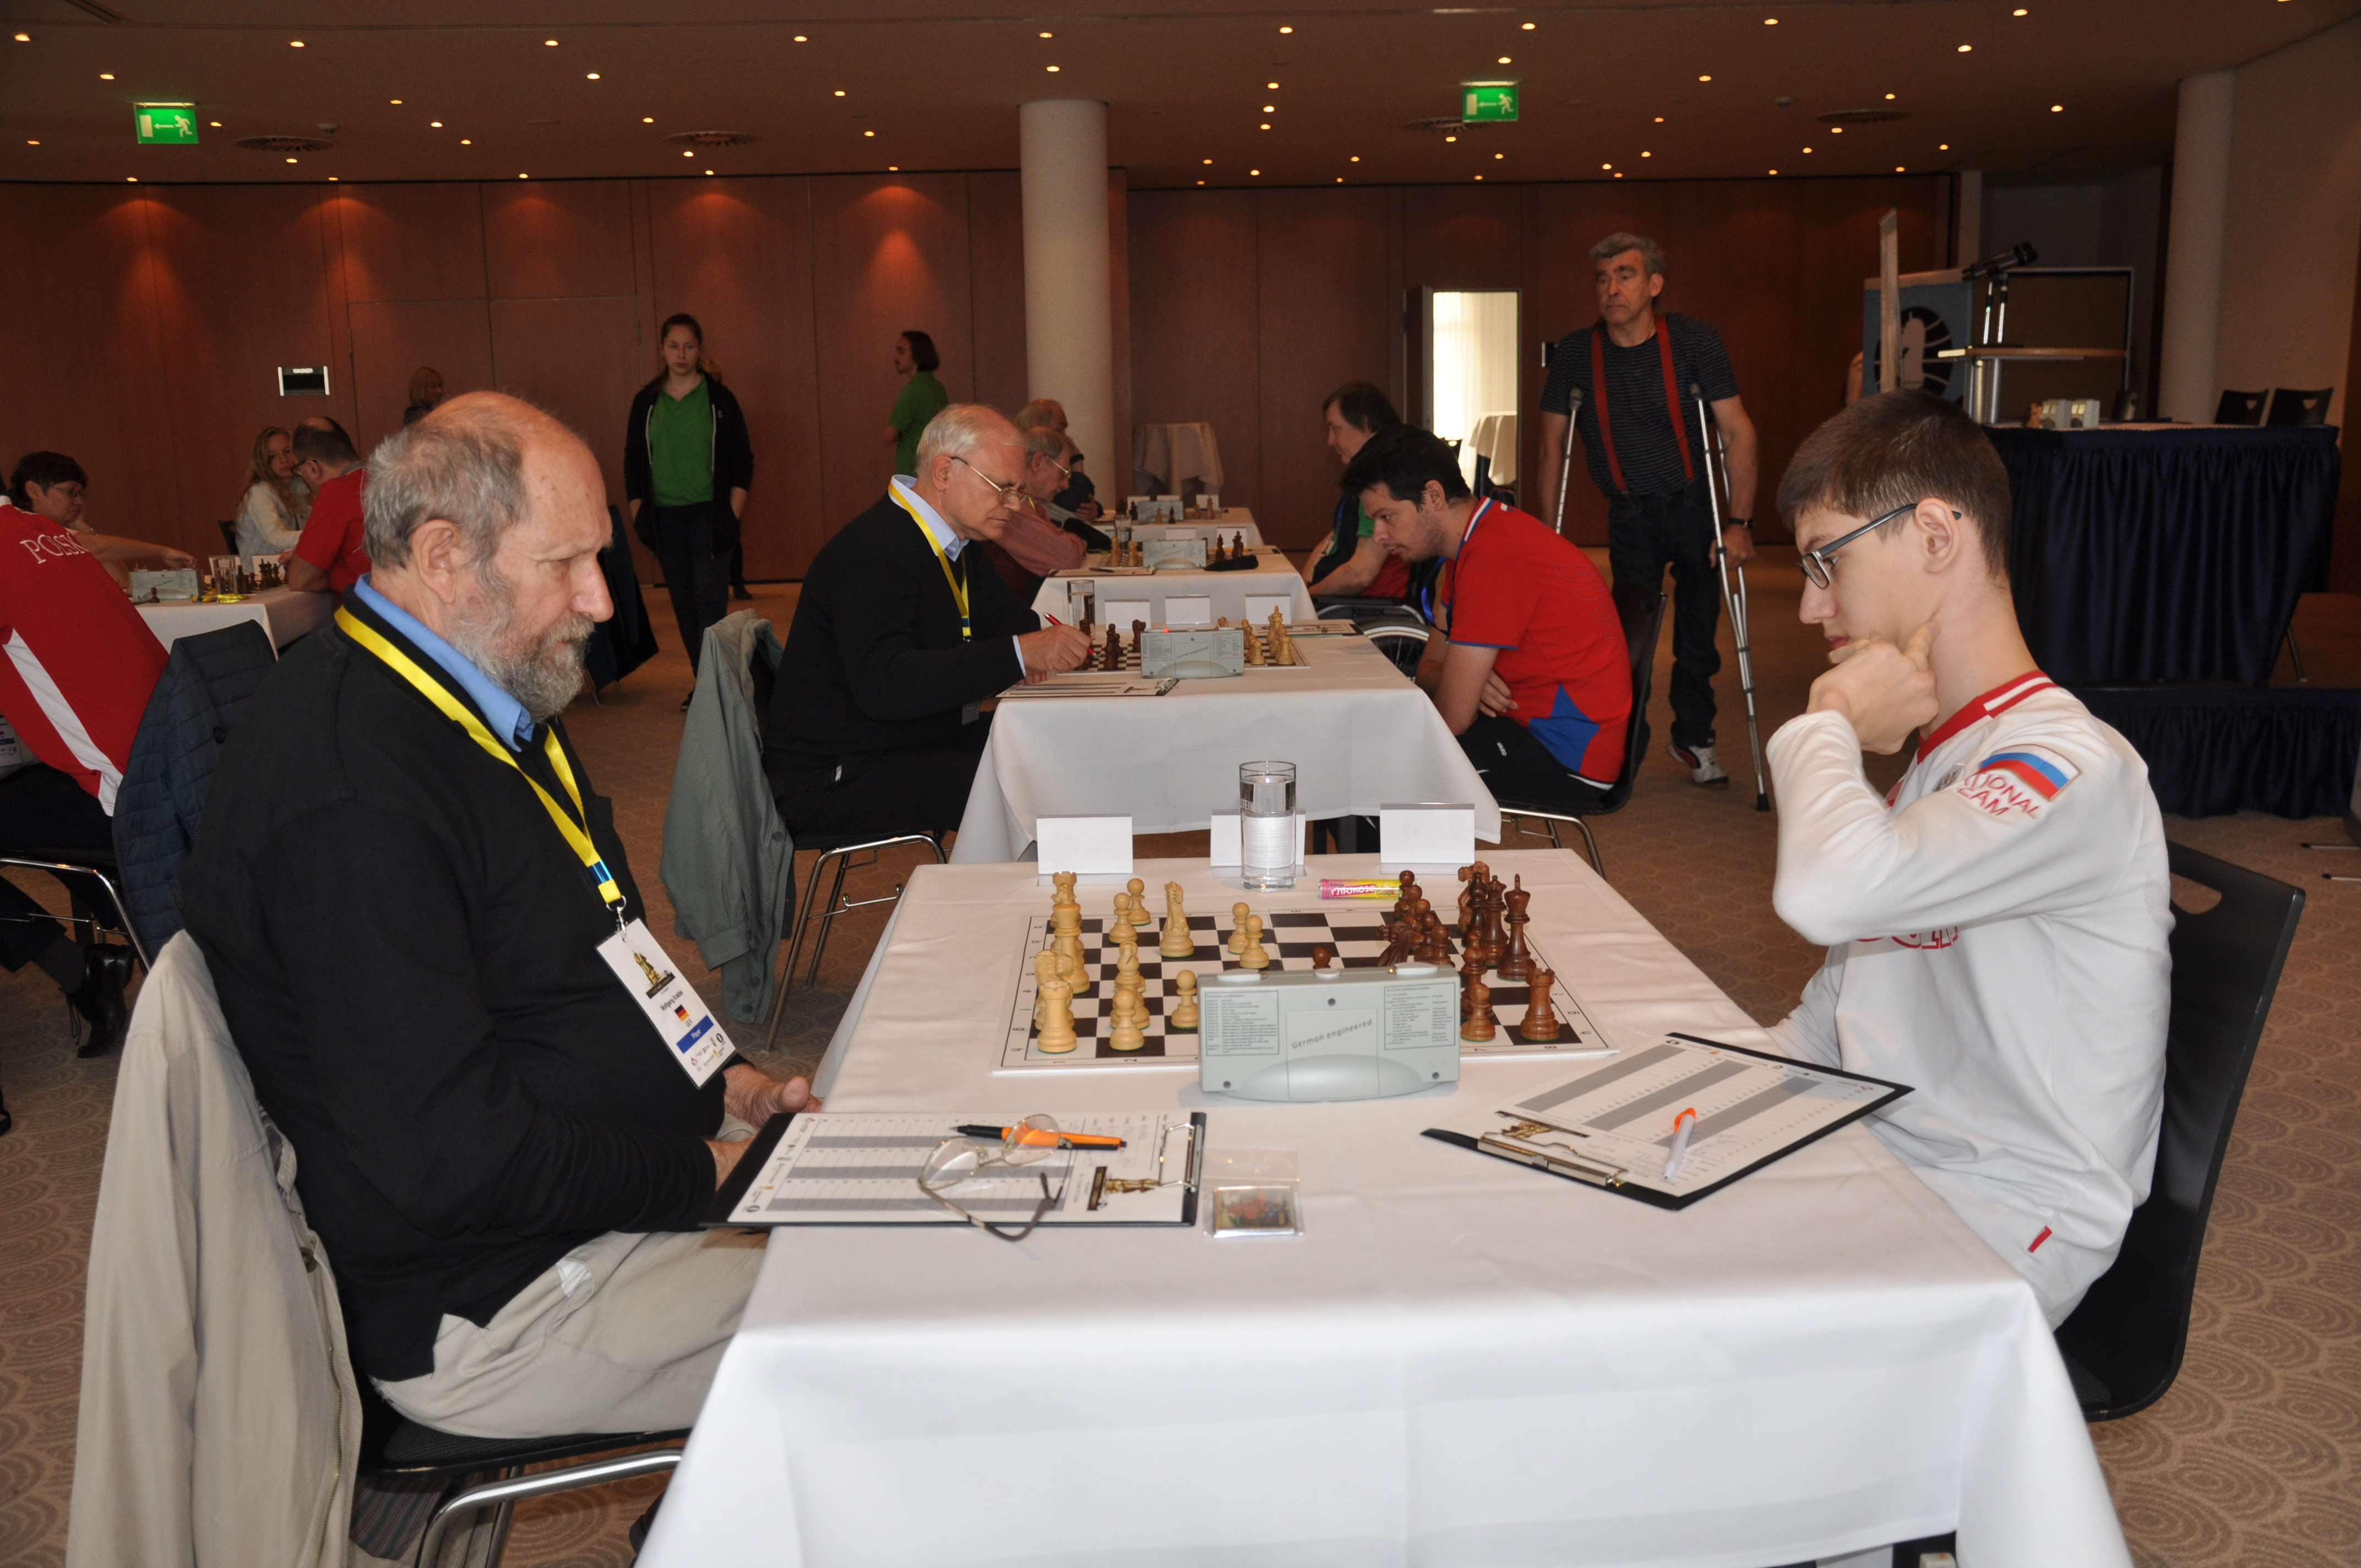 Chess singles dating